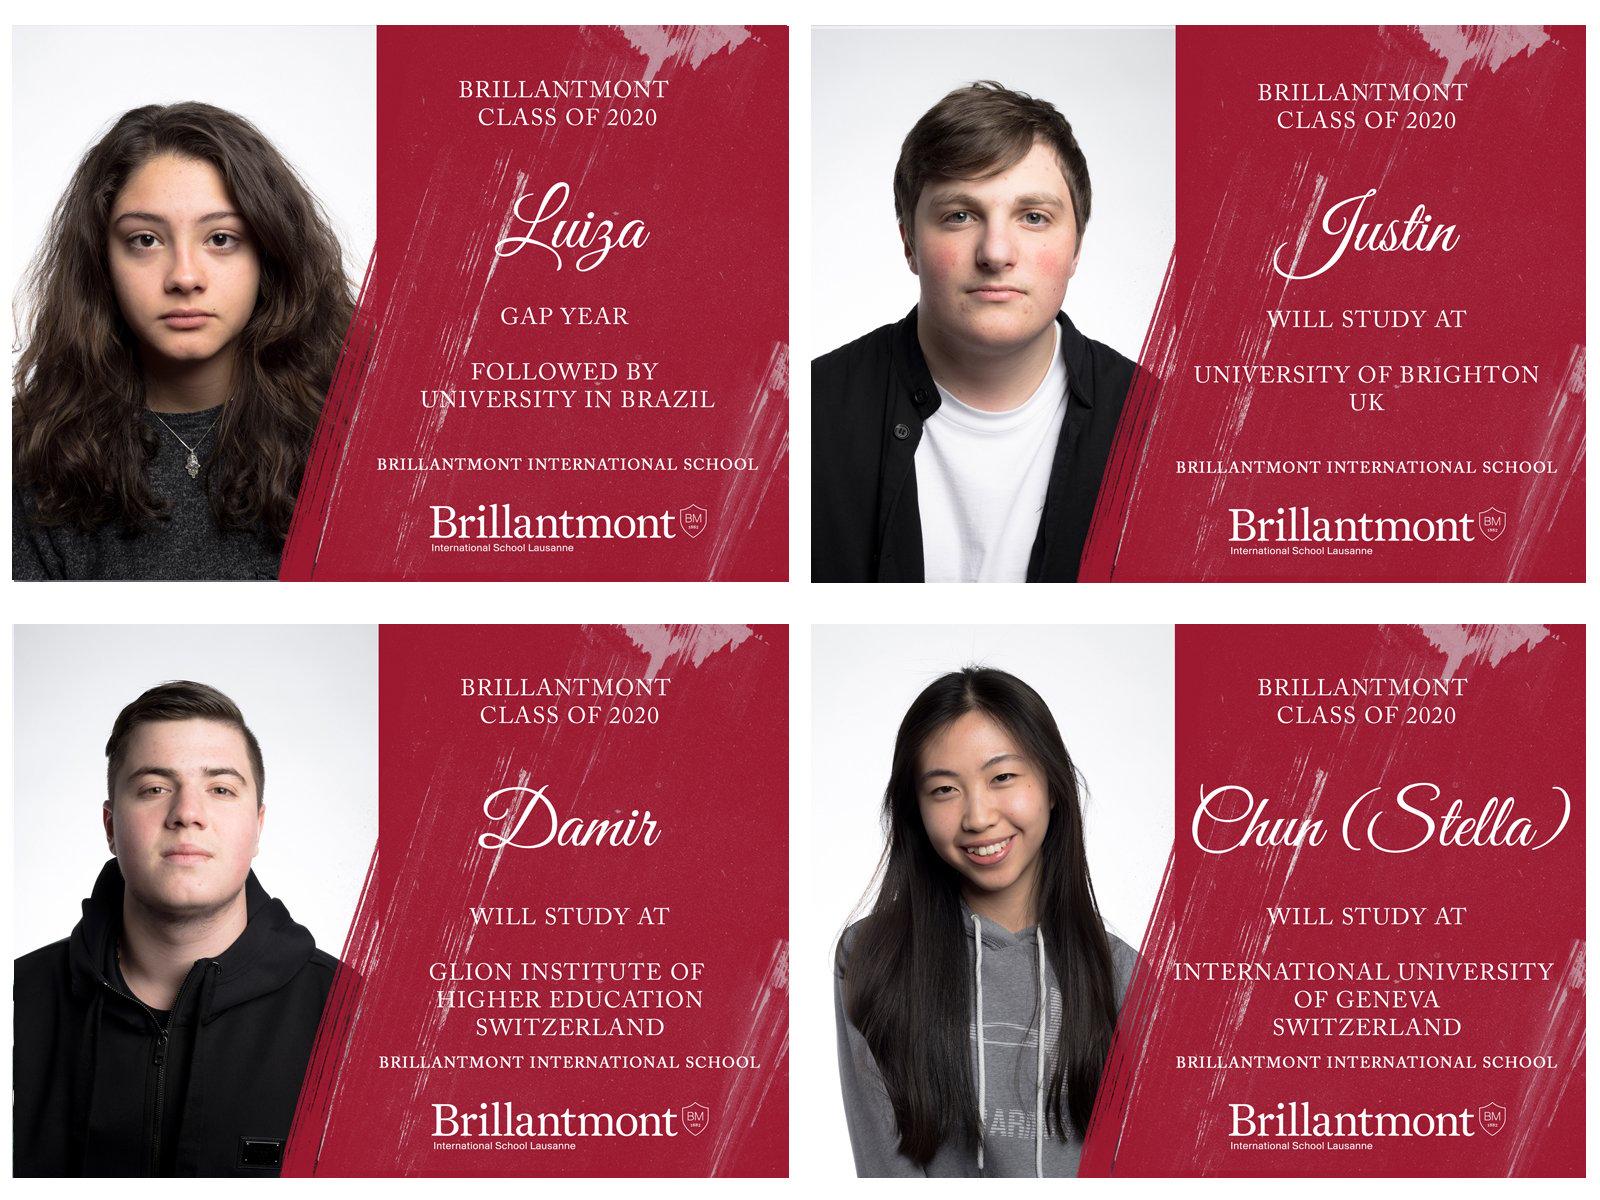 Brillantmont Graduates Class of 2020 - University choices 4